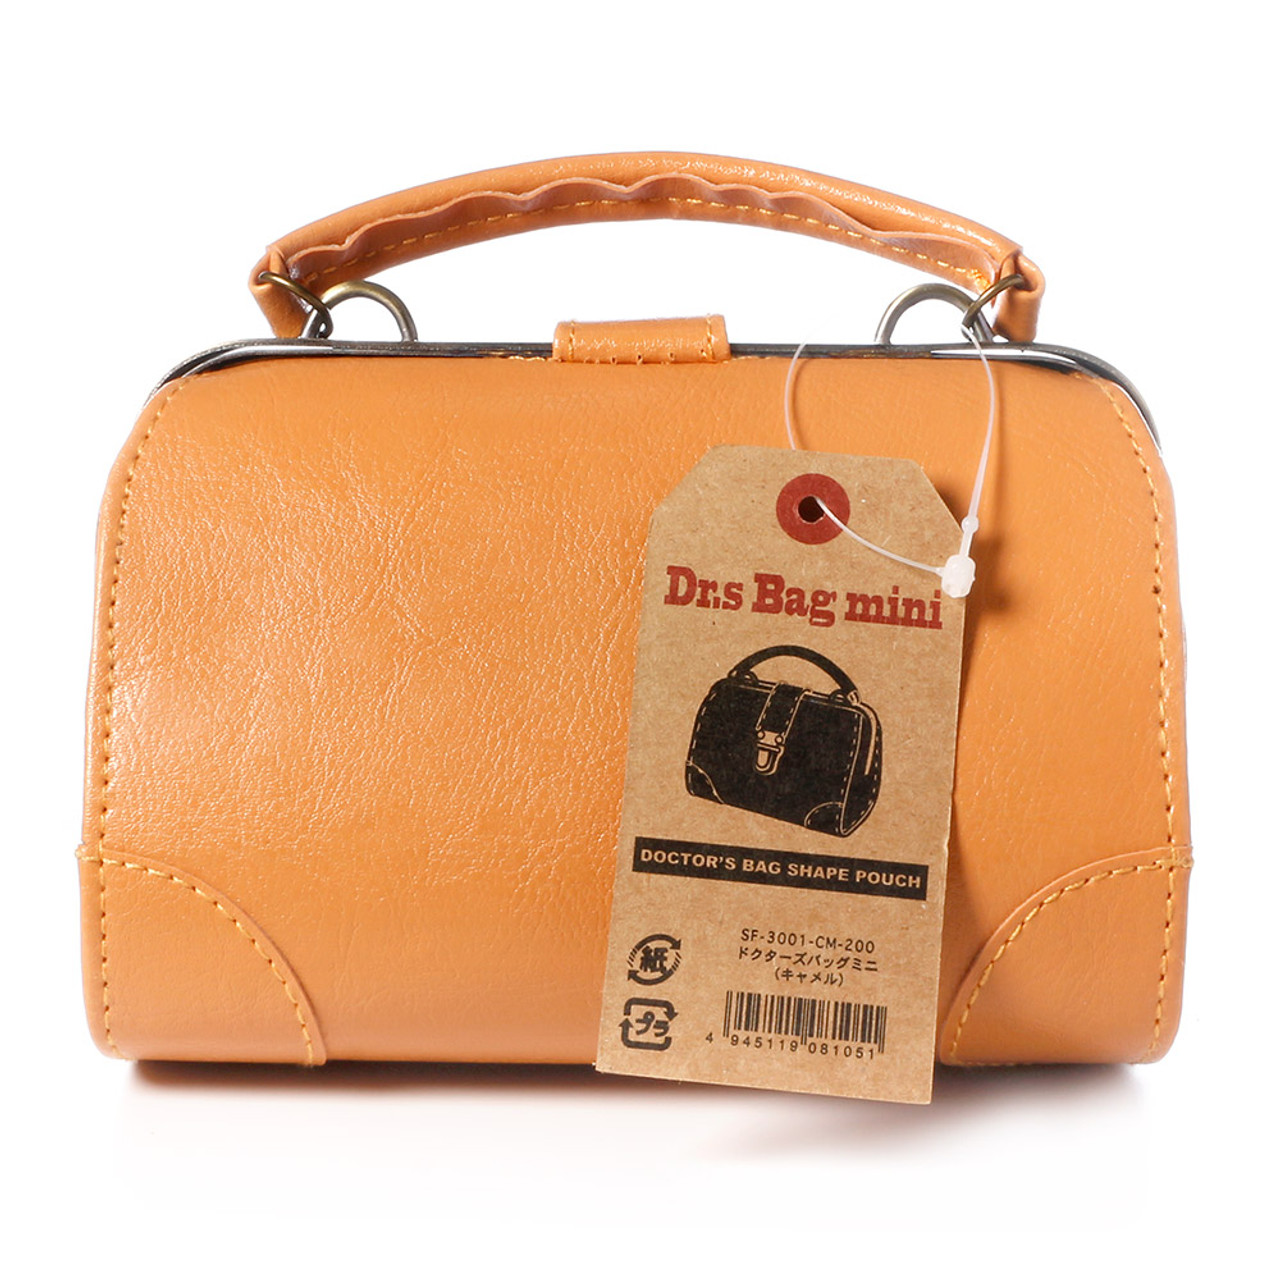 Seto Craft Motif Mini Doctor Bag Shape Pouch / Cosmetic Bag - Camel Color ( Back View )